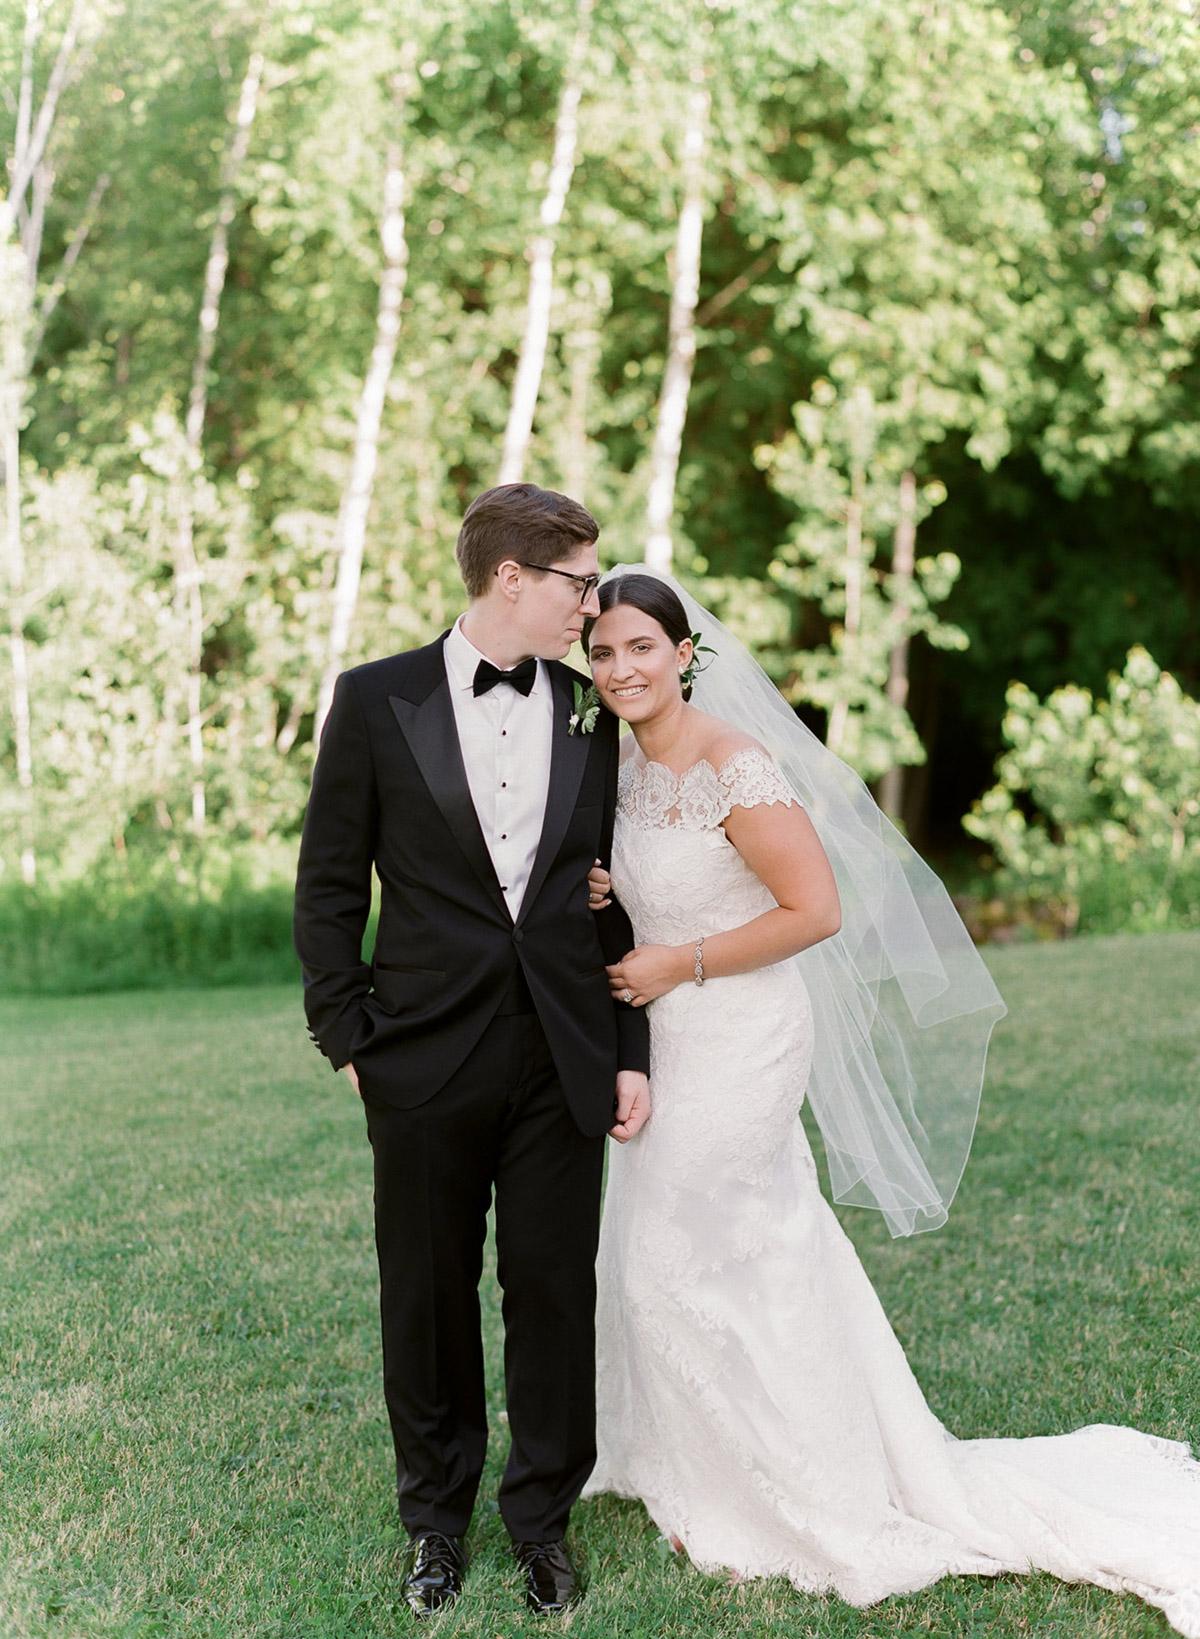 artiese-studios-vineyard-bride-swish-list-private-estate-cambridge-wedding-59.jpg